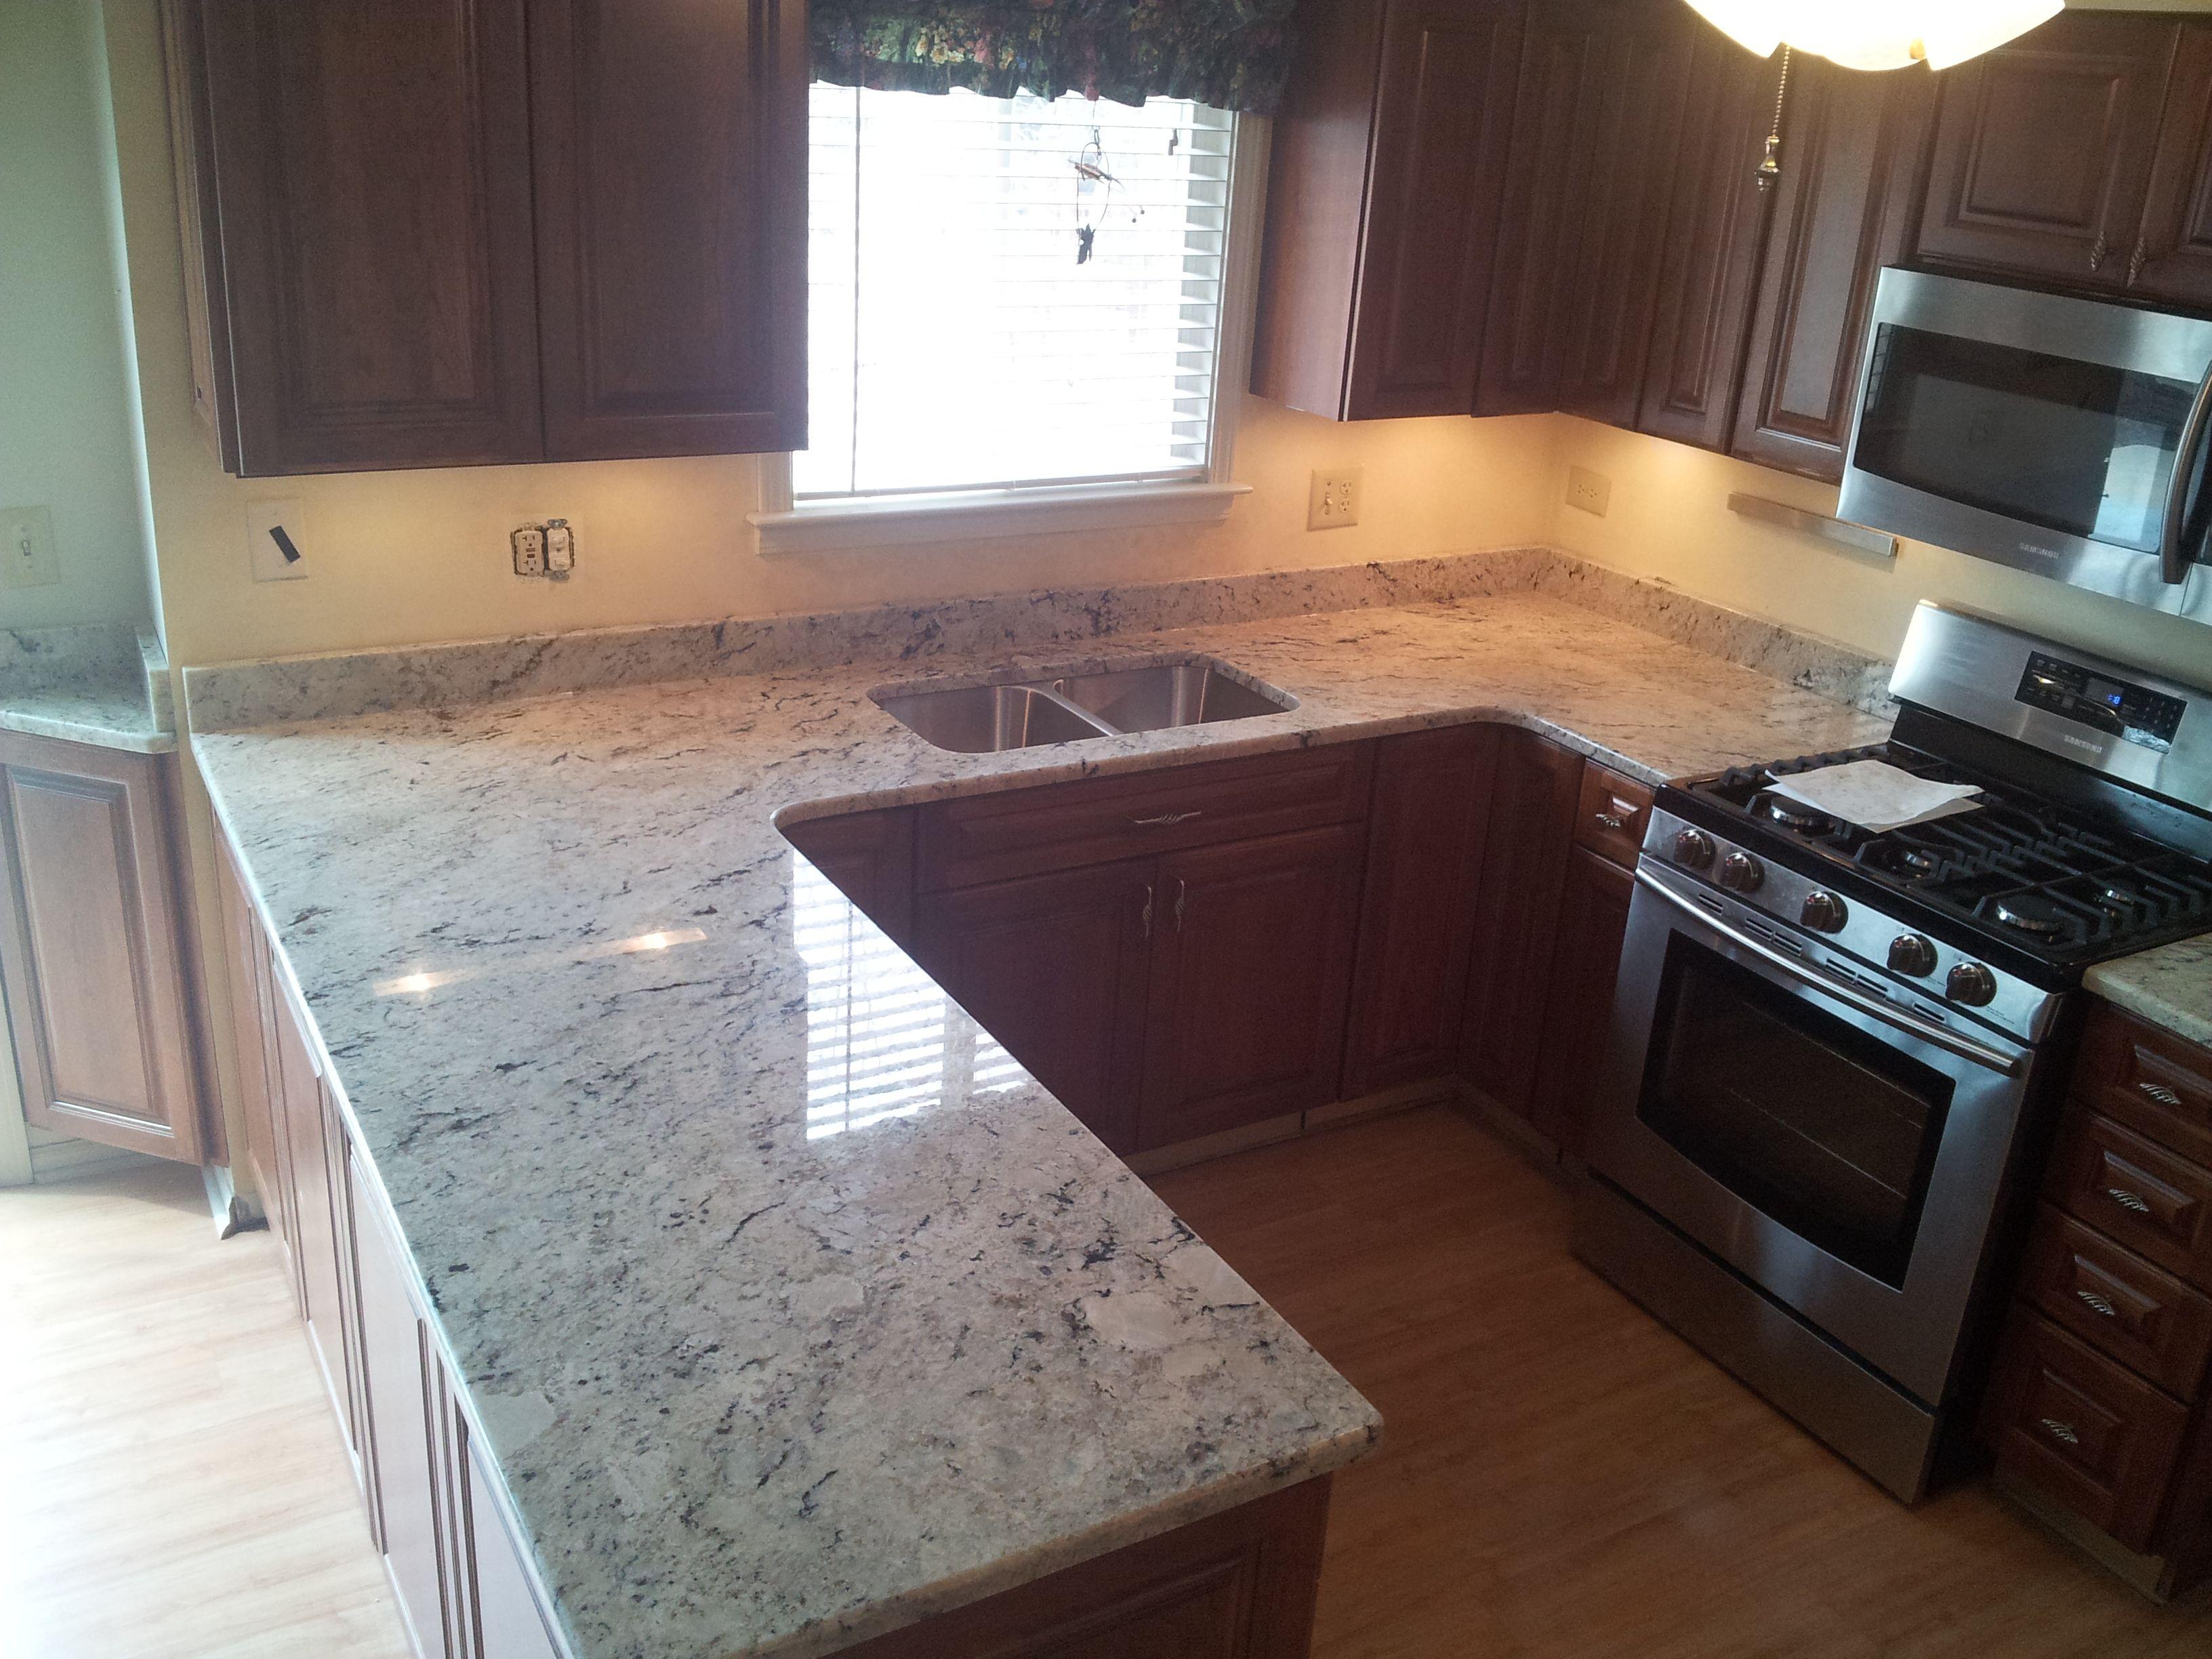 Art Granite Countertops Inc 1020 Lunt Ave Unit F Schaumburg Il 60193 Tell 847 923 1323 Email Granit White Countertops Kitchen Projects Granite Countertops